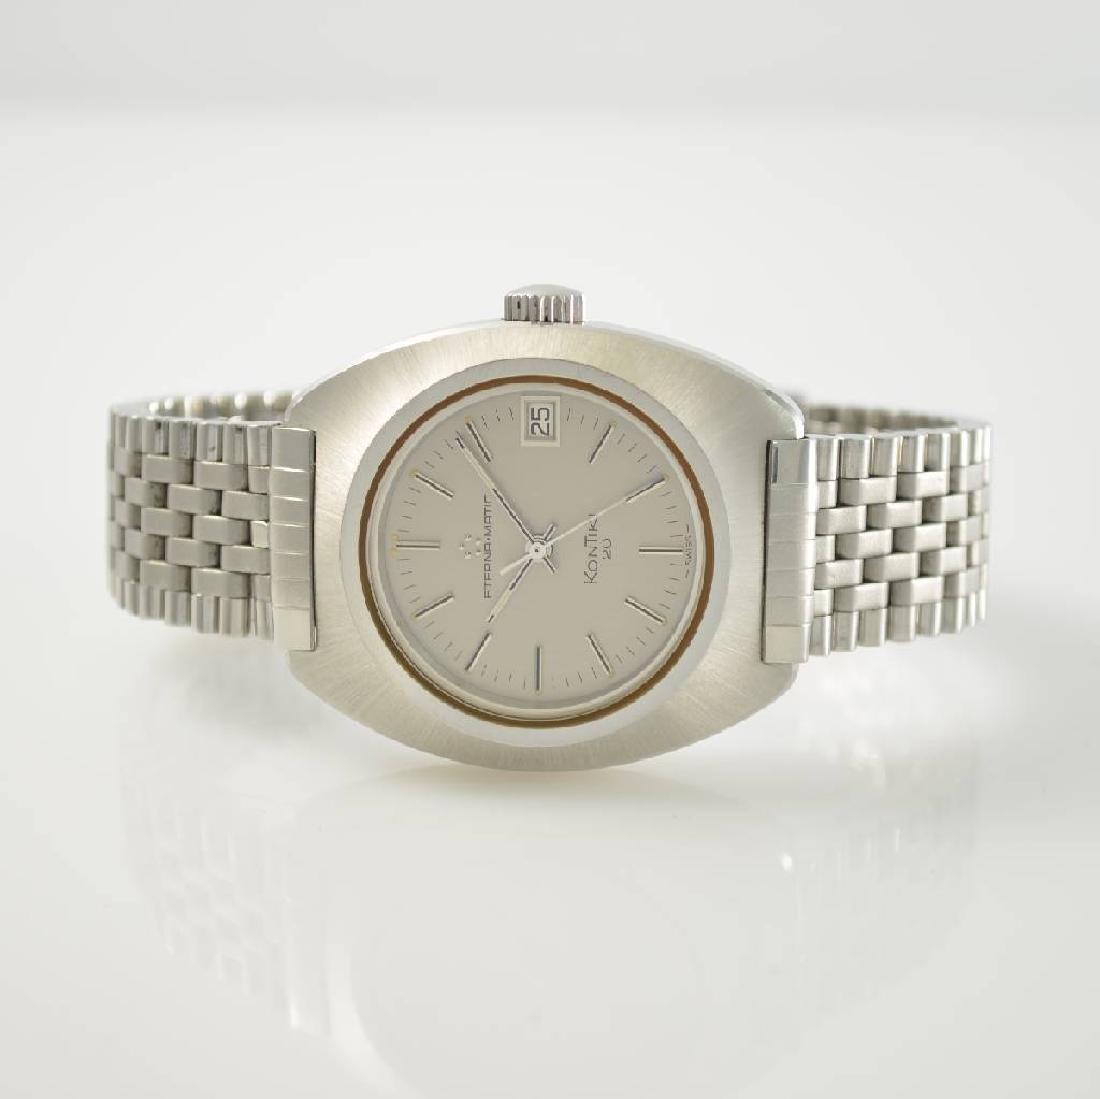 ETERNA-MATIC KonTiki 20 unused gents wristwatch